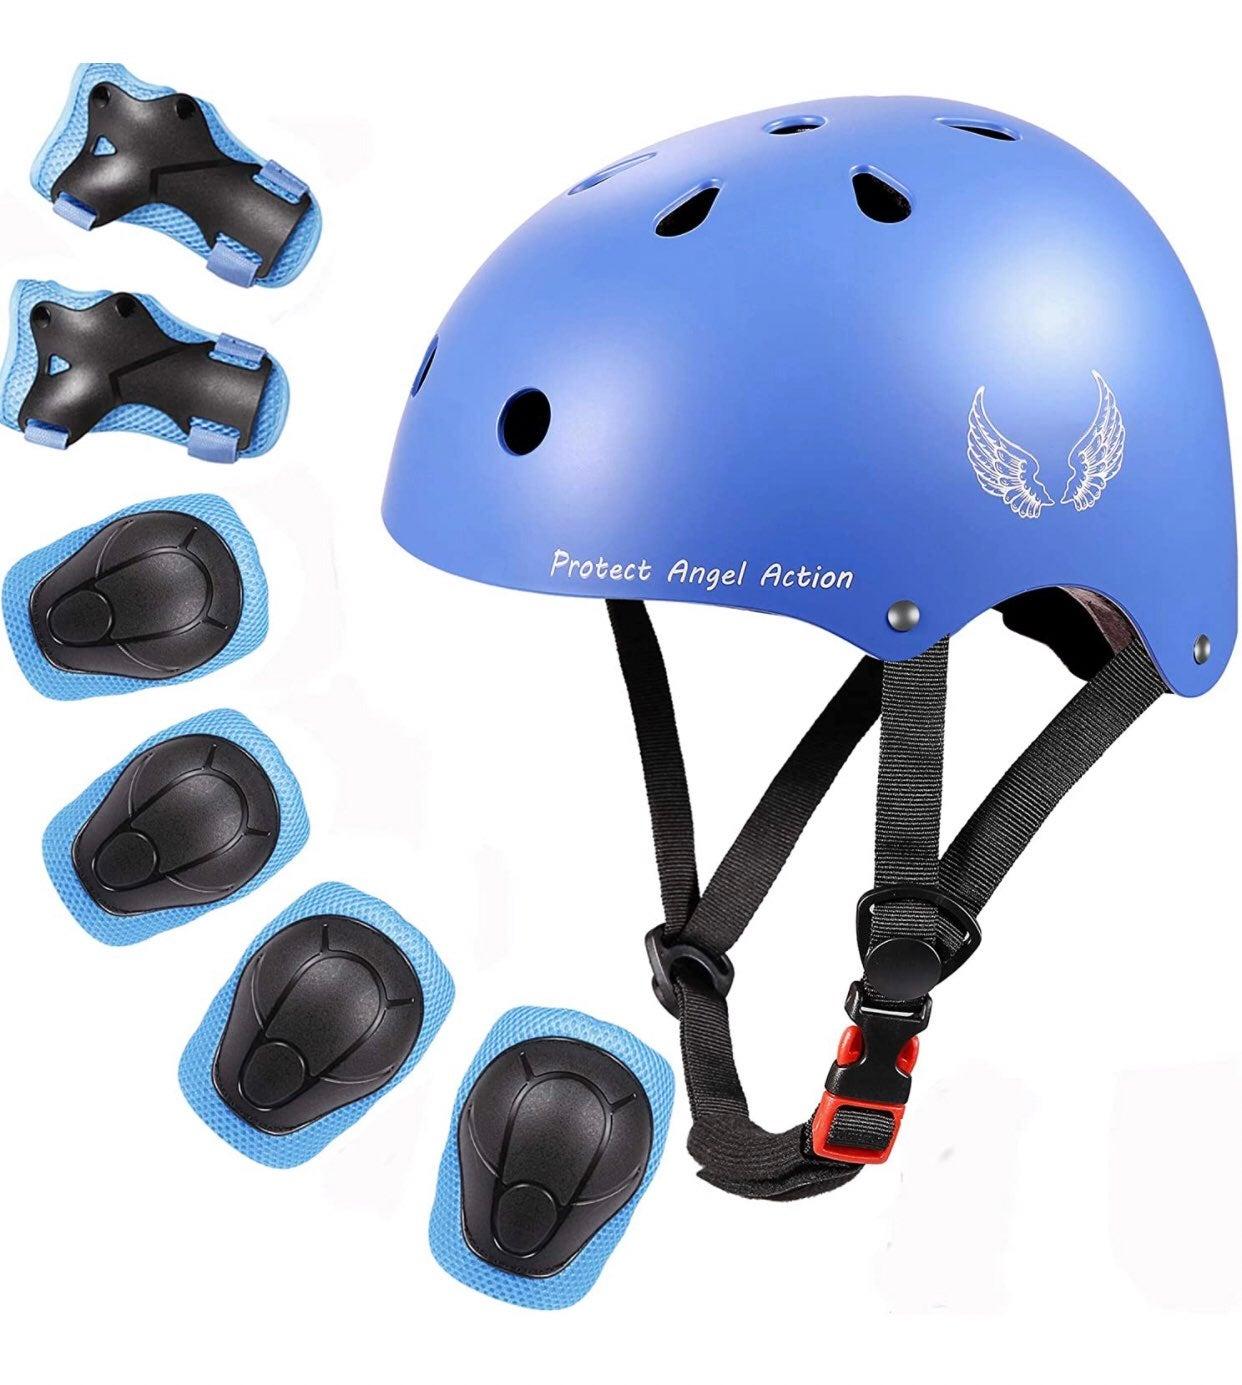 Kids Helmet w/ Protective Gear Set